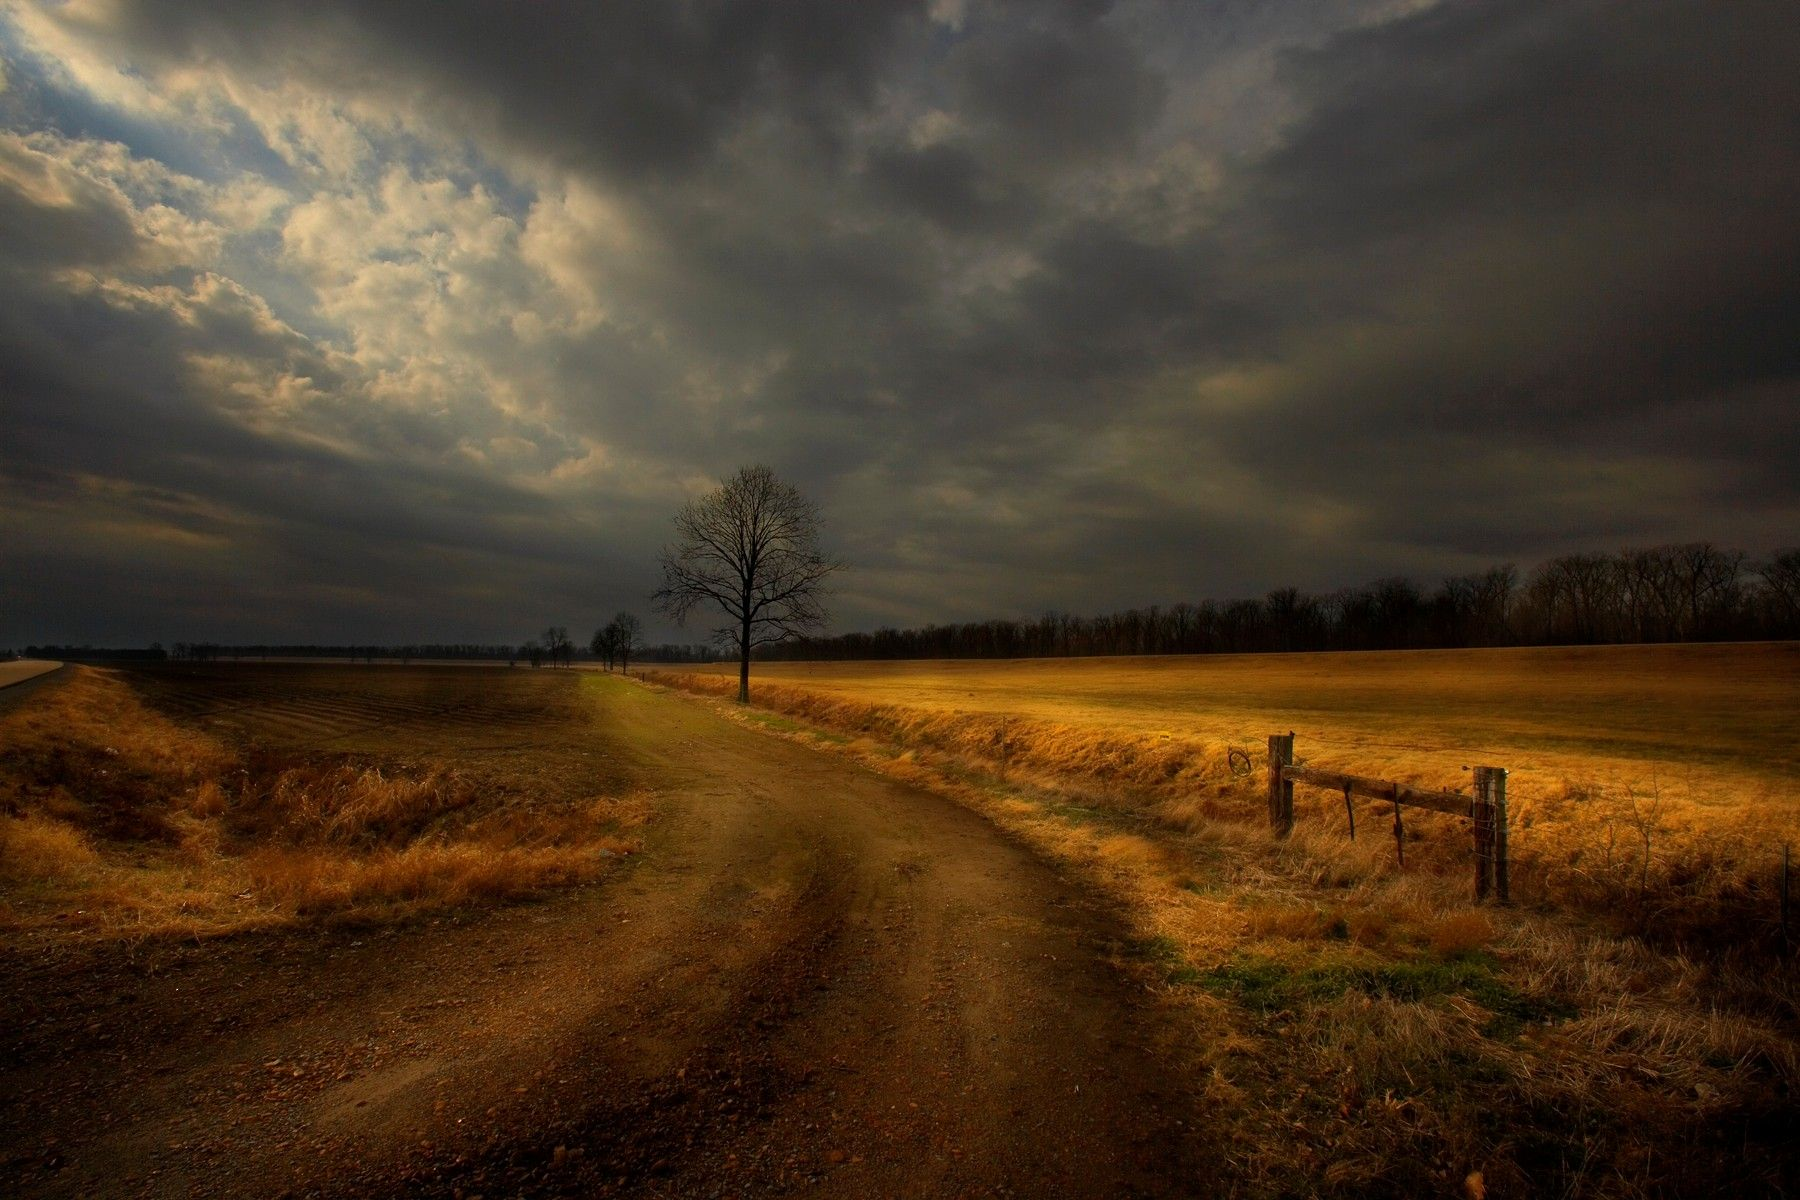 old_farm_road_tunica_mississippi.jpg